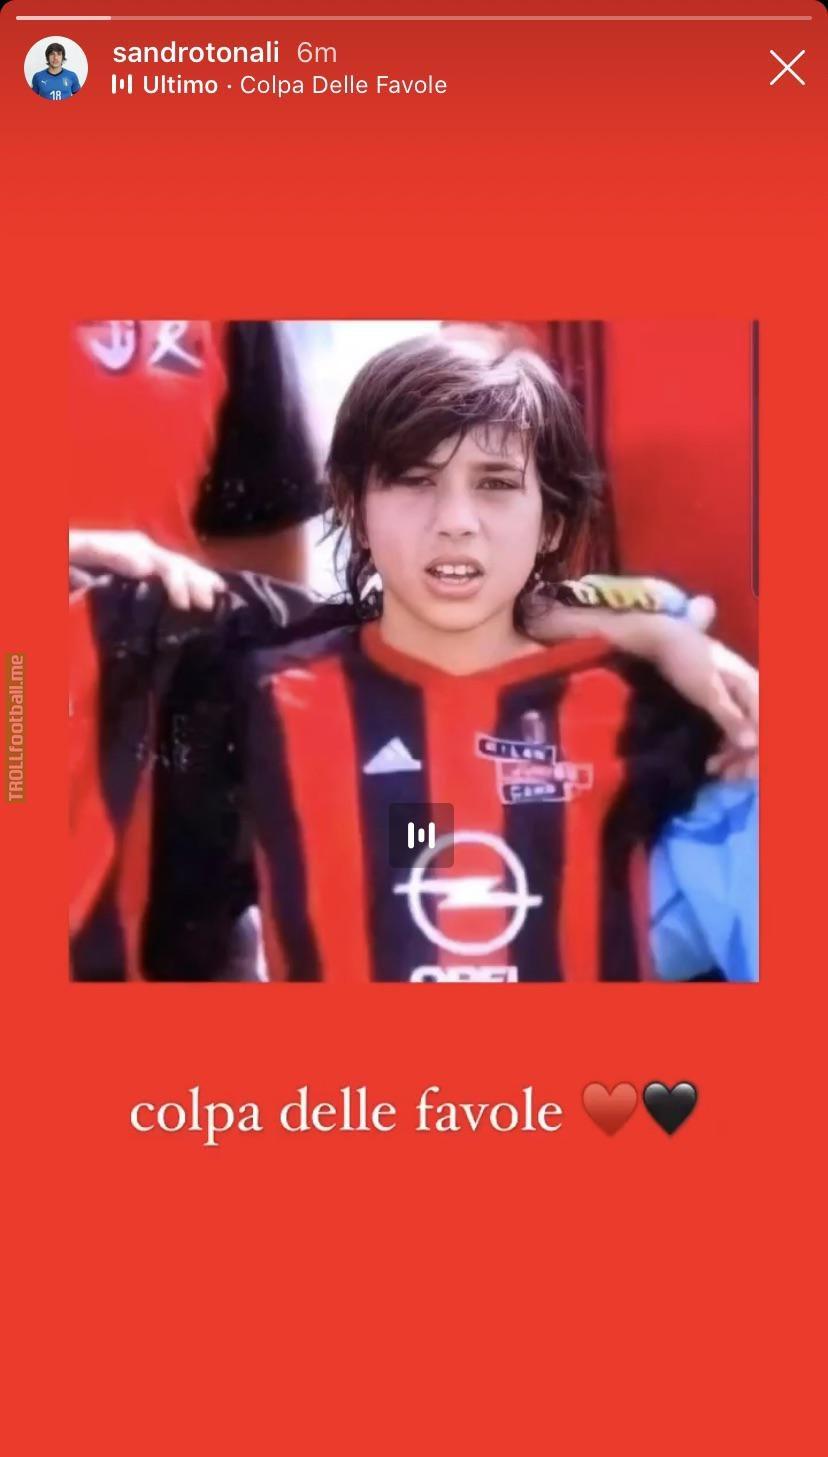 Tonali announces himself as a Milan player